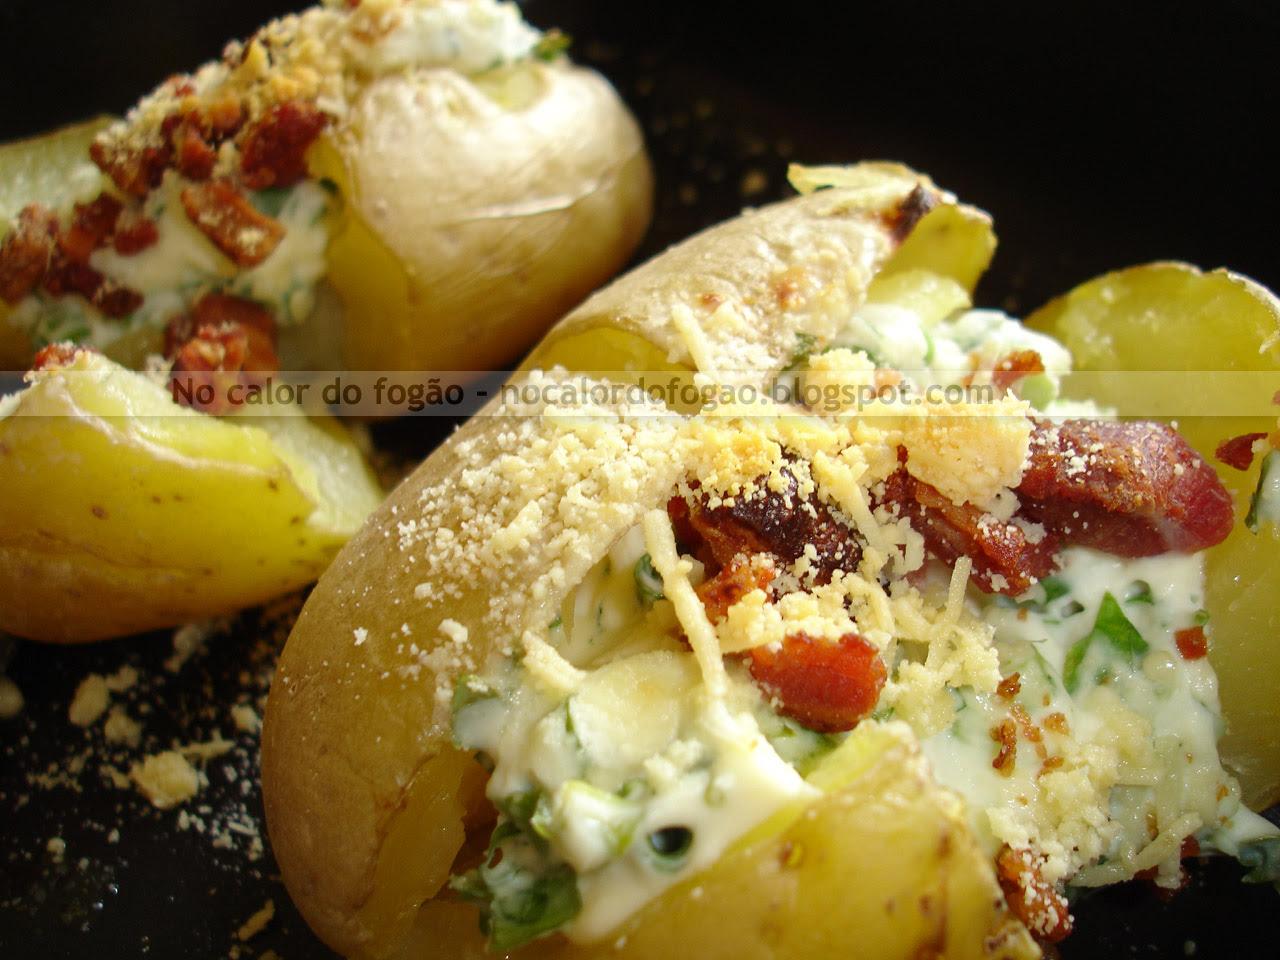 Jacked potato